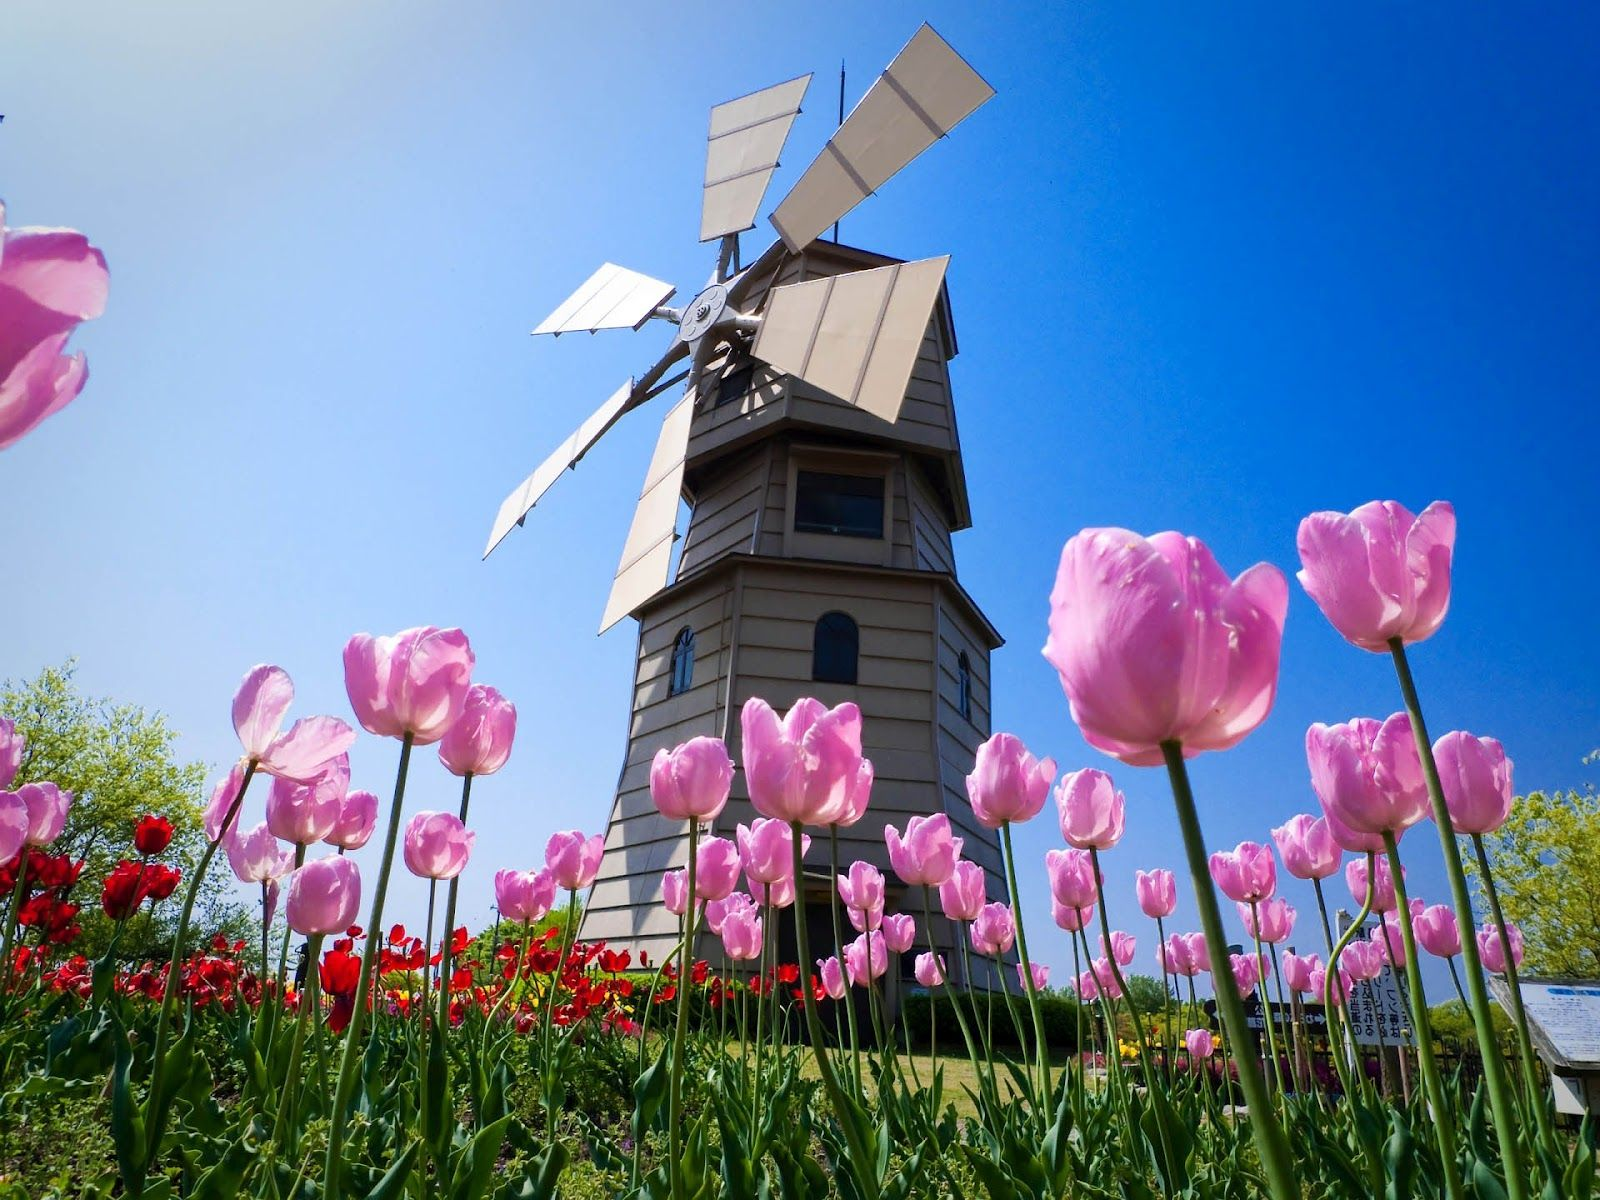 Dutch Windmill And Tulips Spring Wallpaper Flower Desktop Wallpaper Spring Flowers